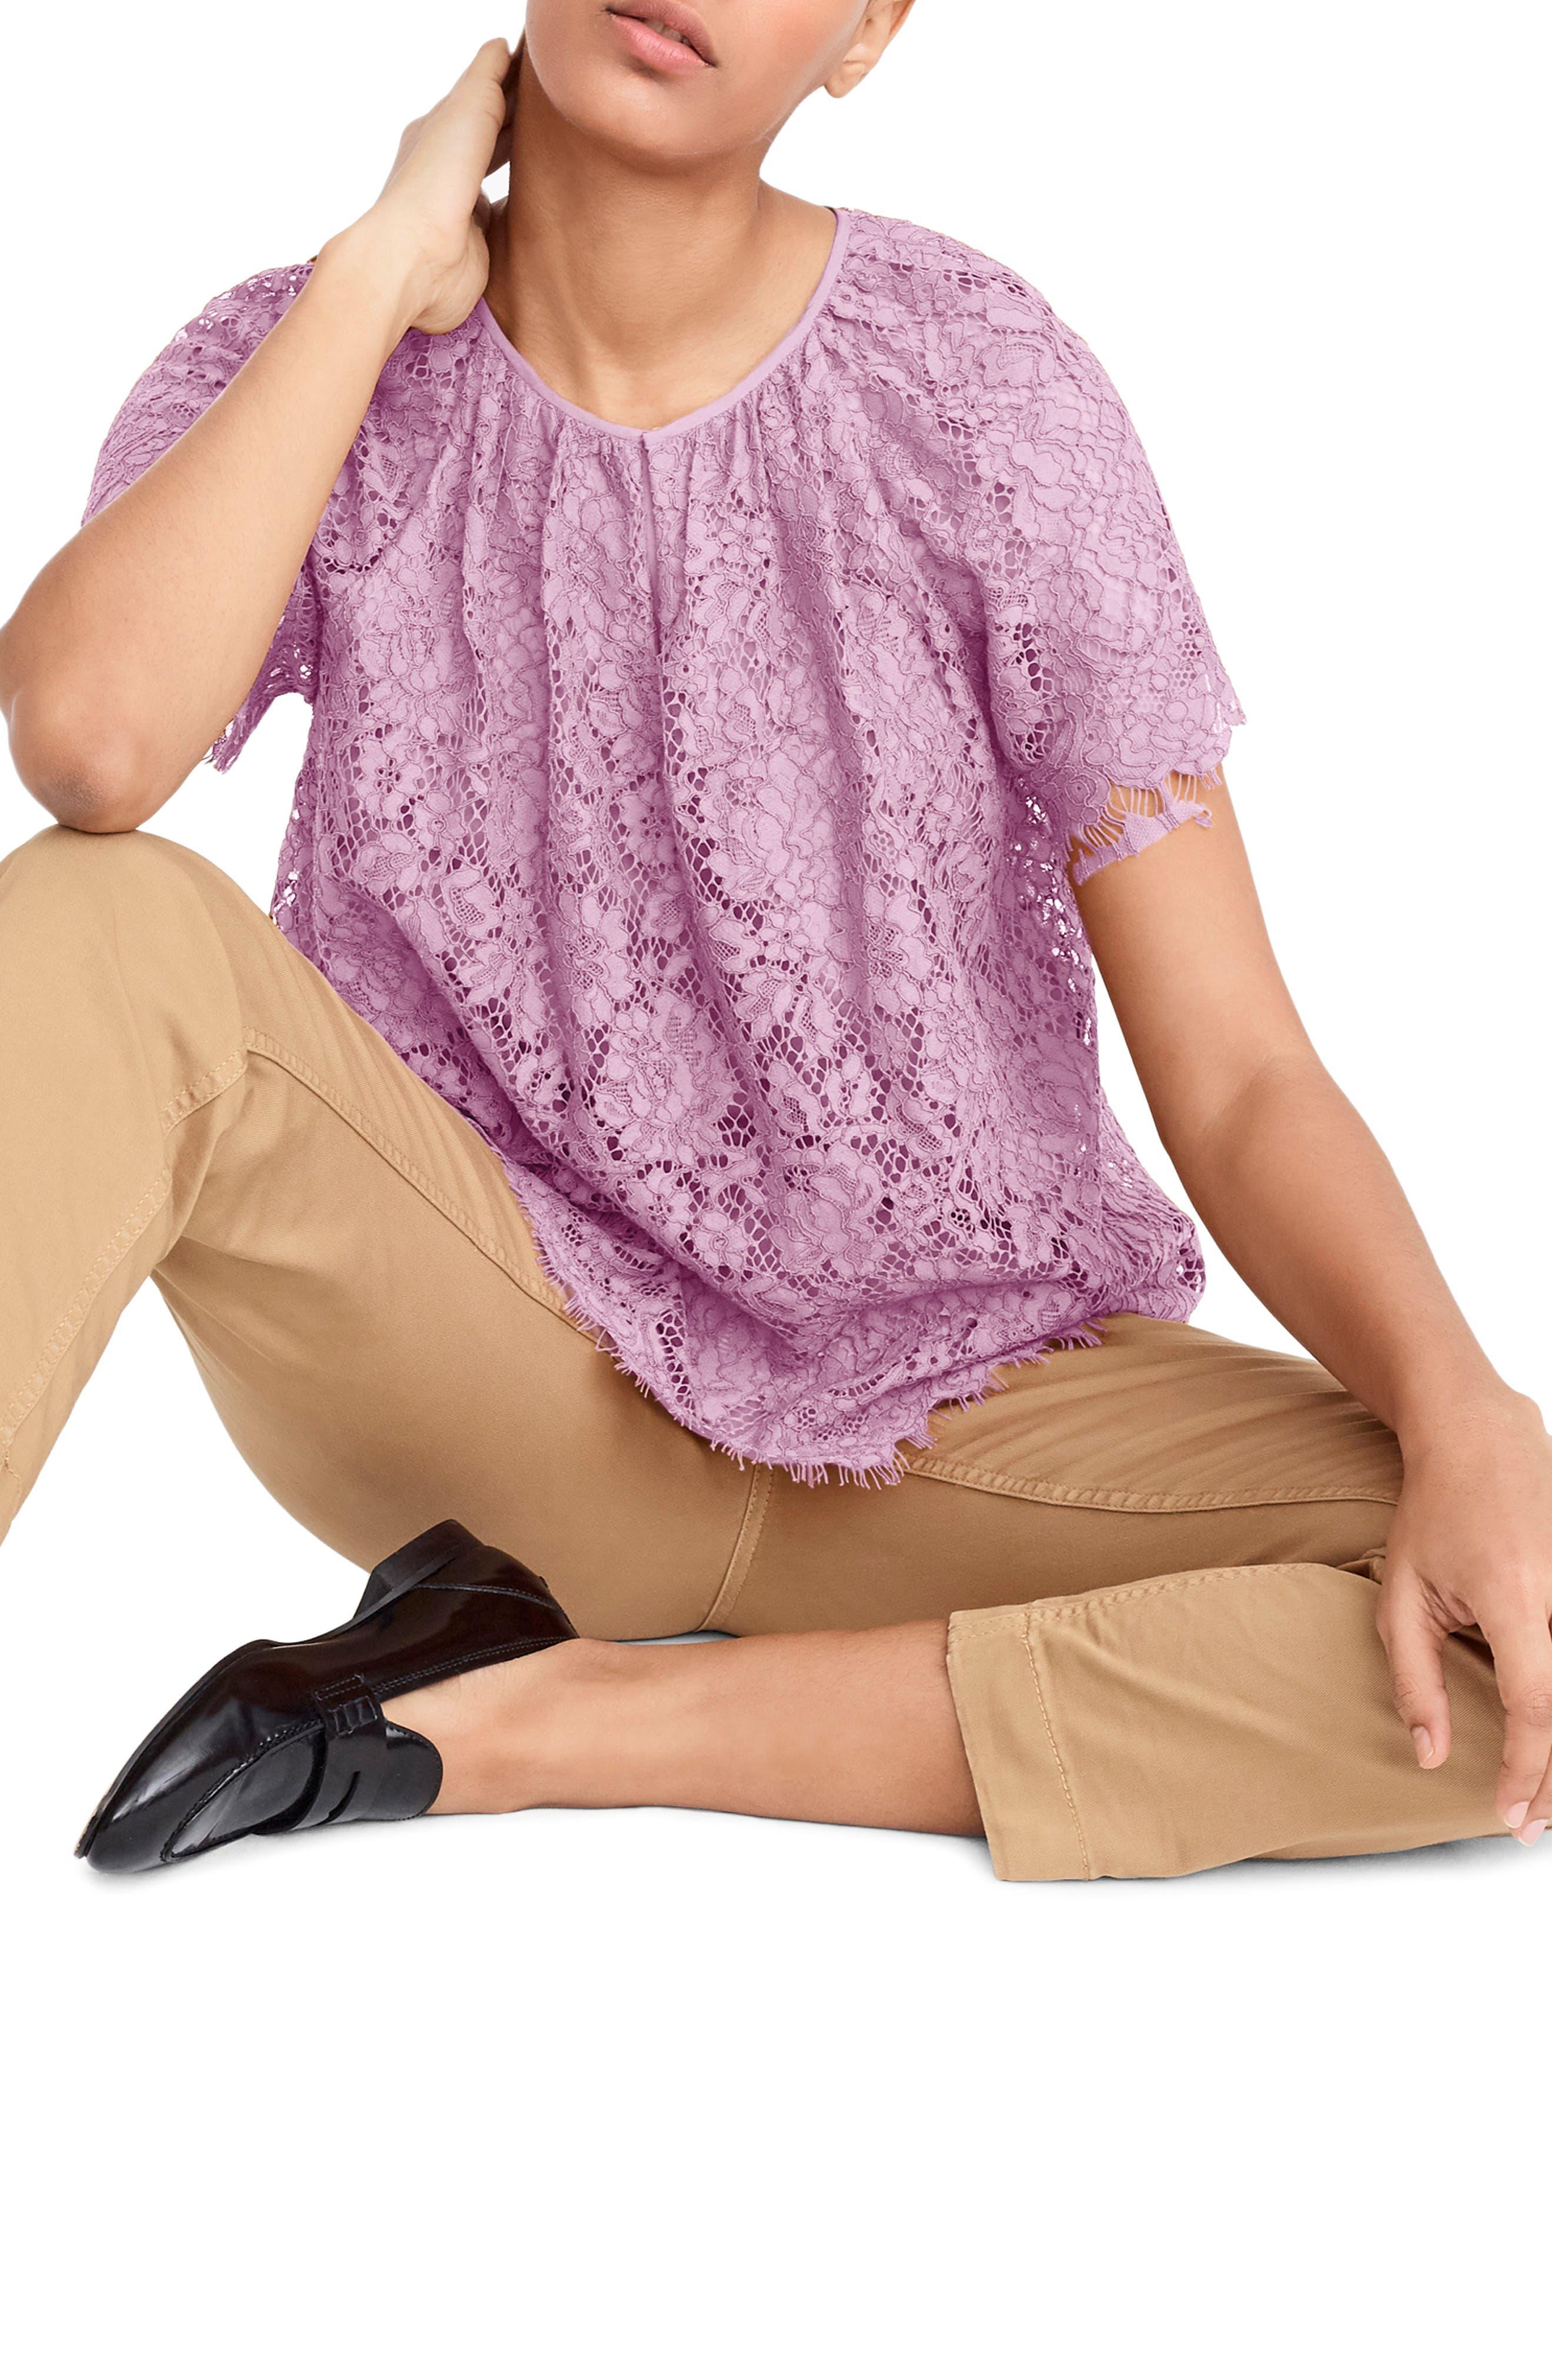 J.CREW Short Sleeve Lace Top, Main, color, VIVID LILAC